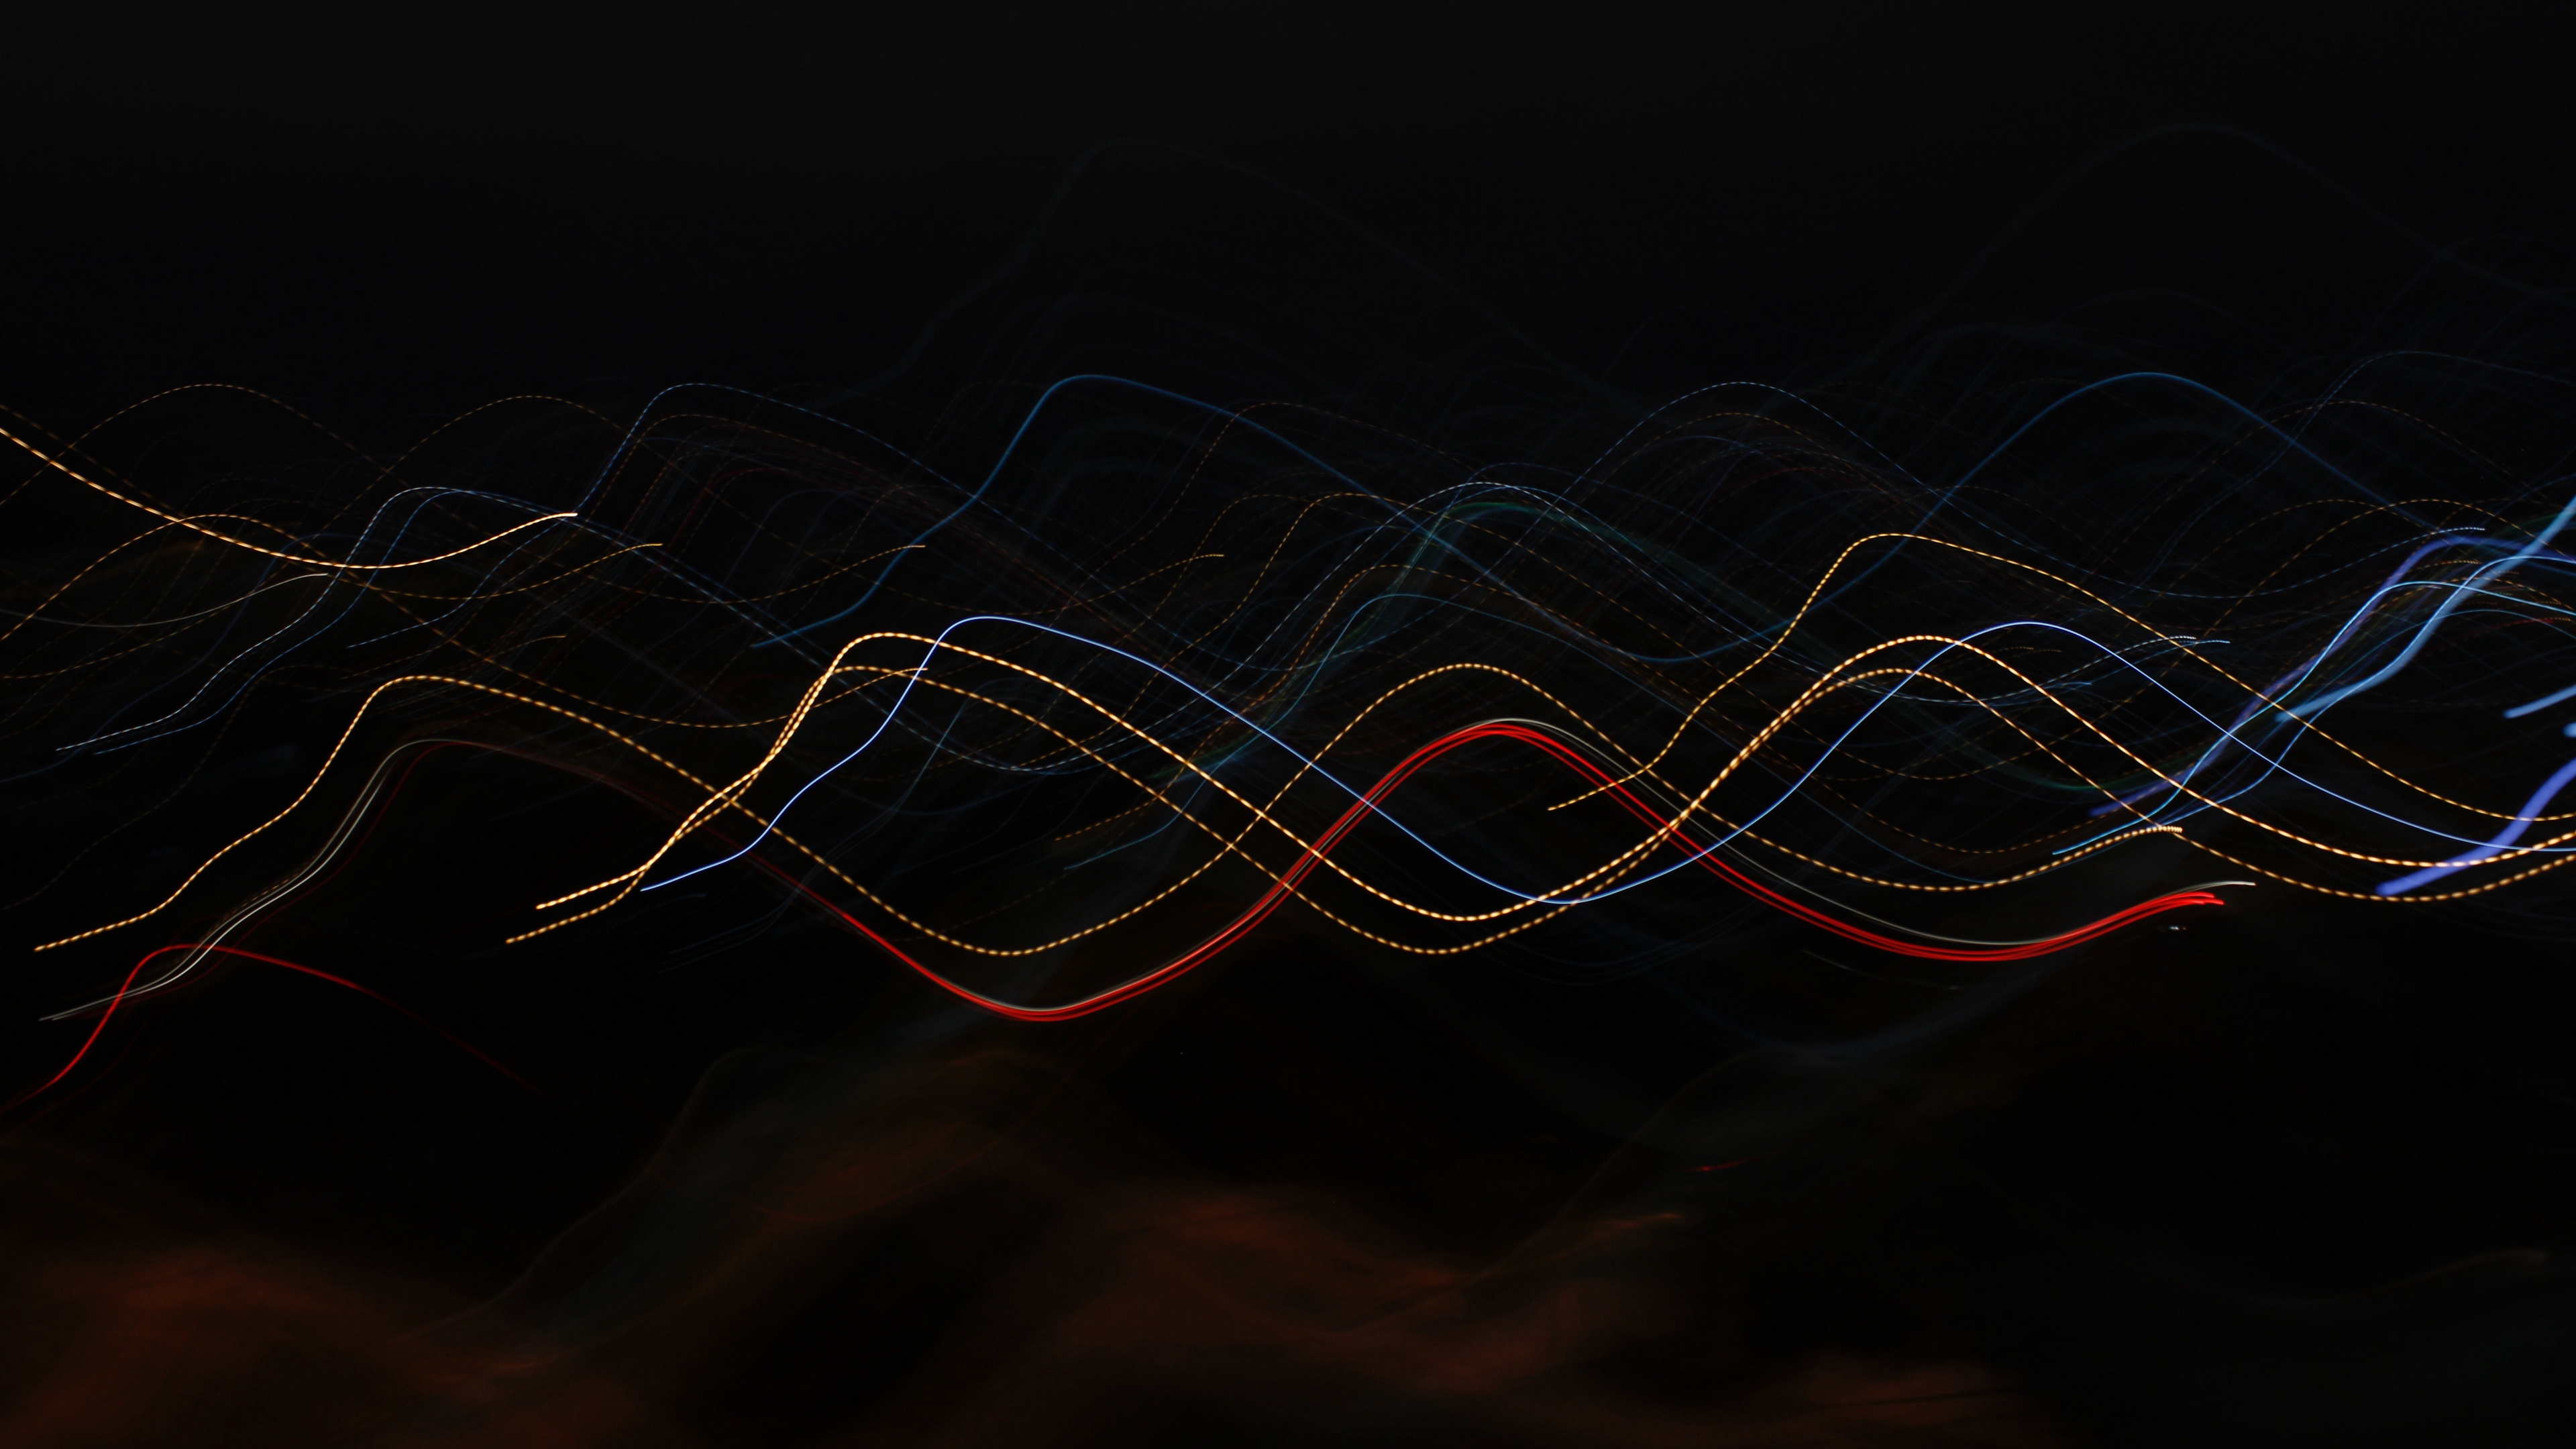 lines intermittent wavy 4k 1539369753 - lines, intermittent, wavy 4k - wavy, Lines, intermittent